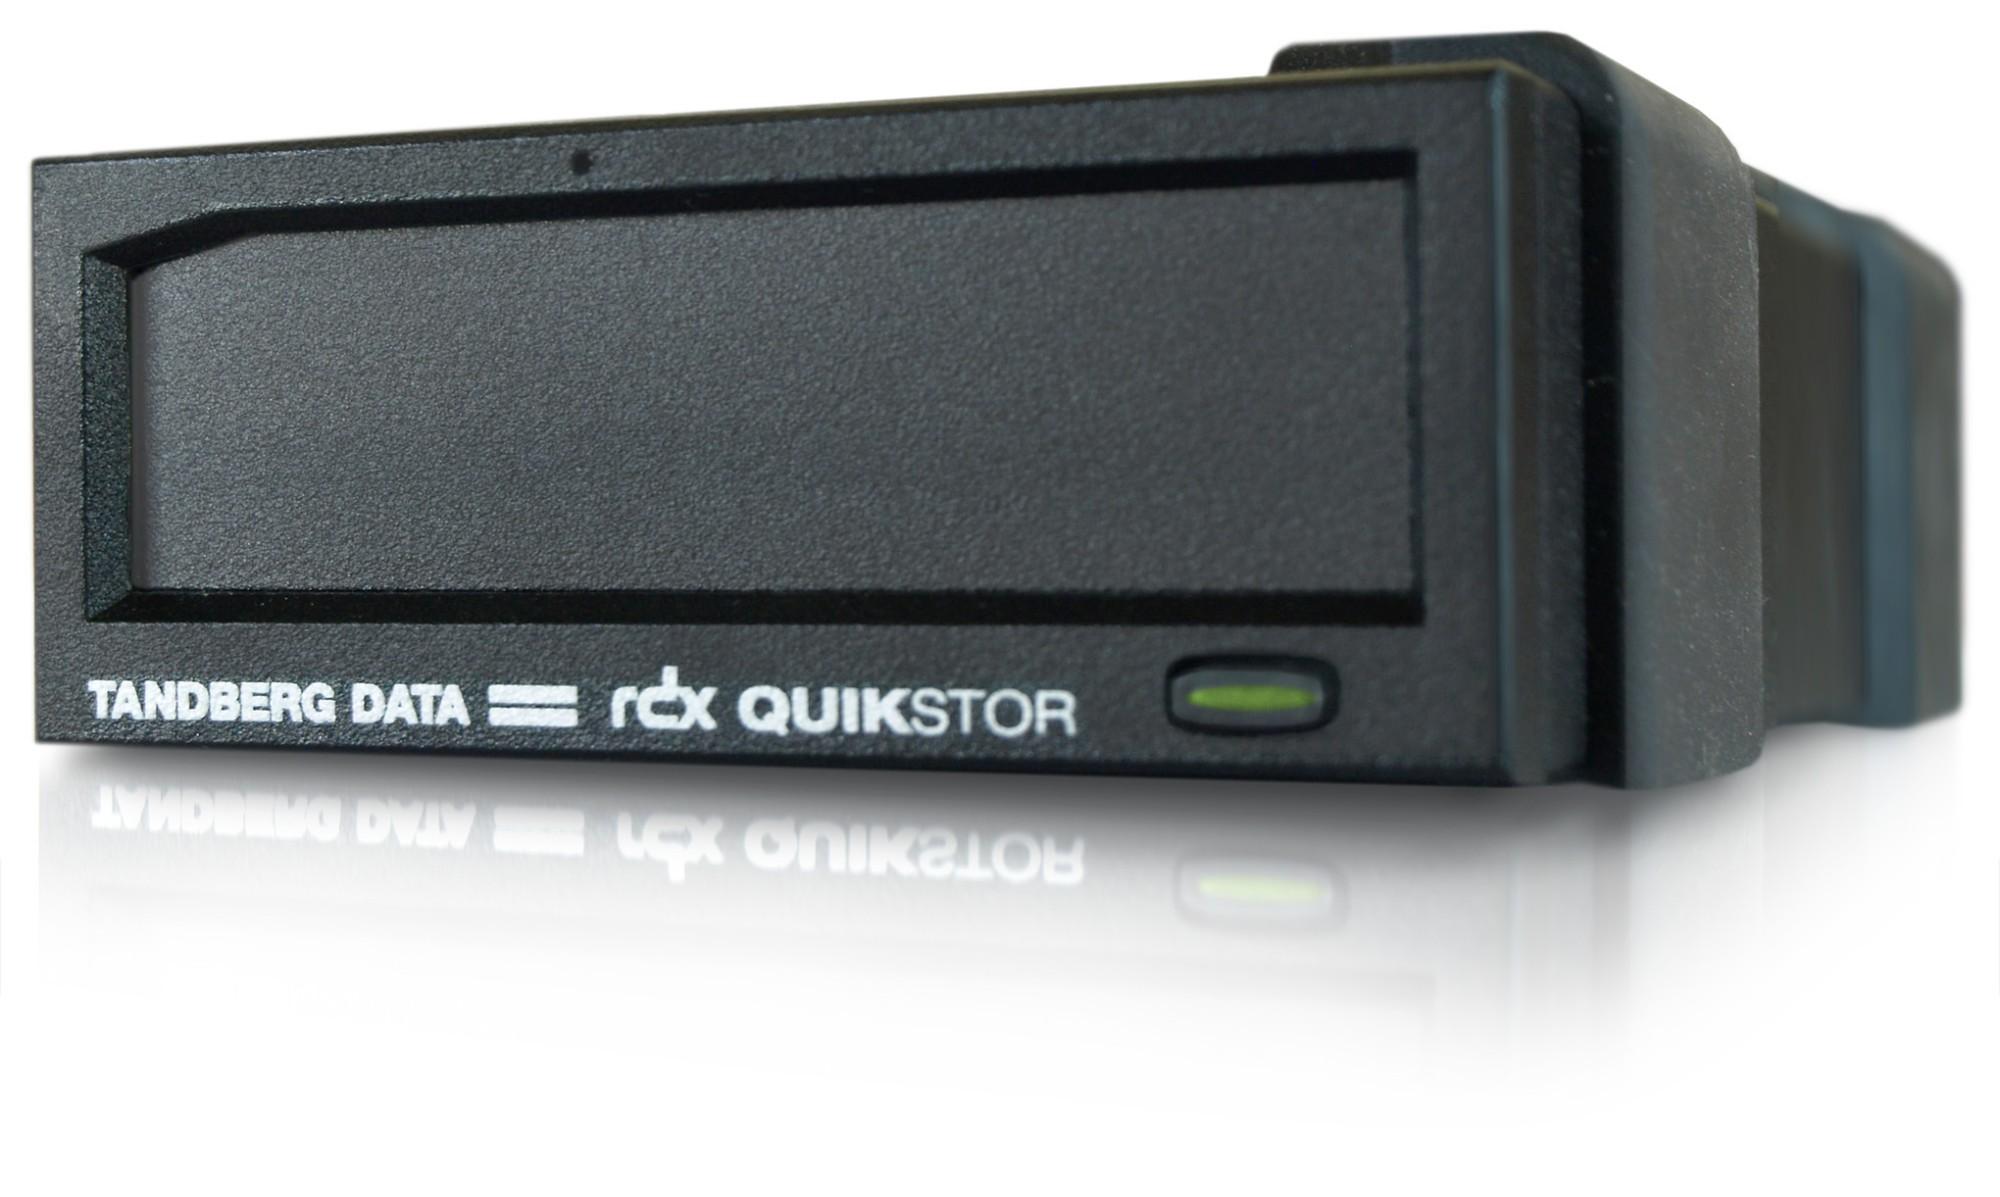 Rdx Bare Drive USB 3.0+ Externak Black